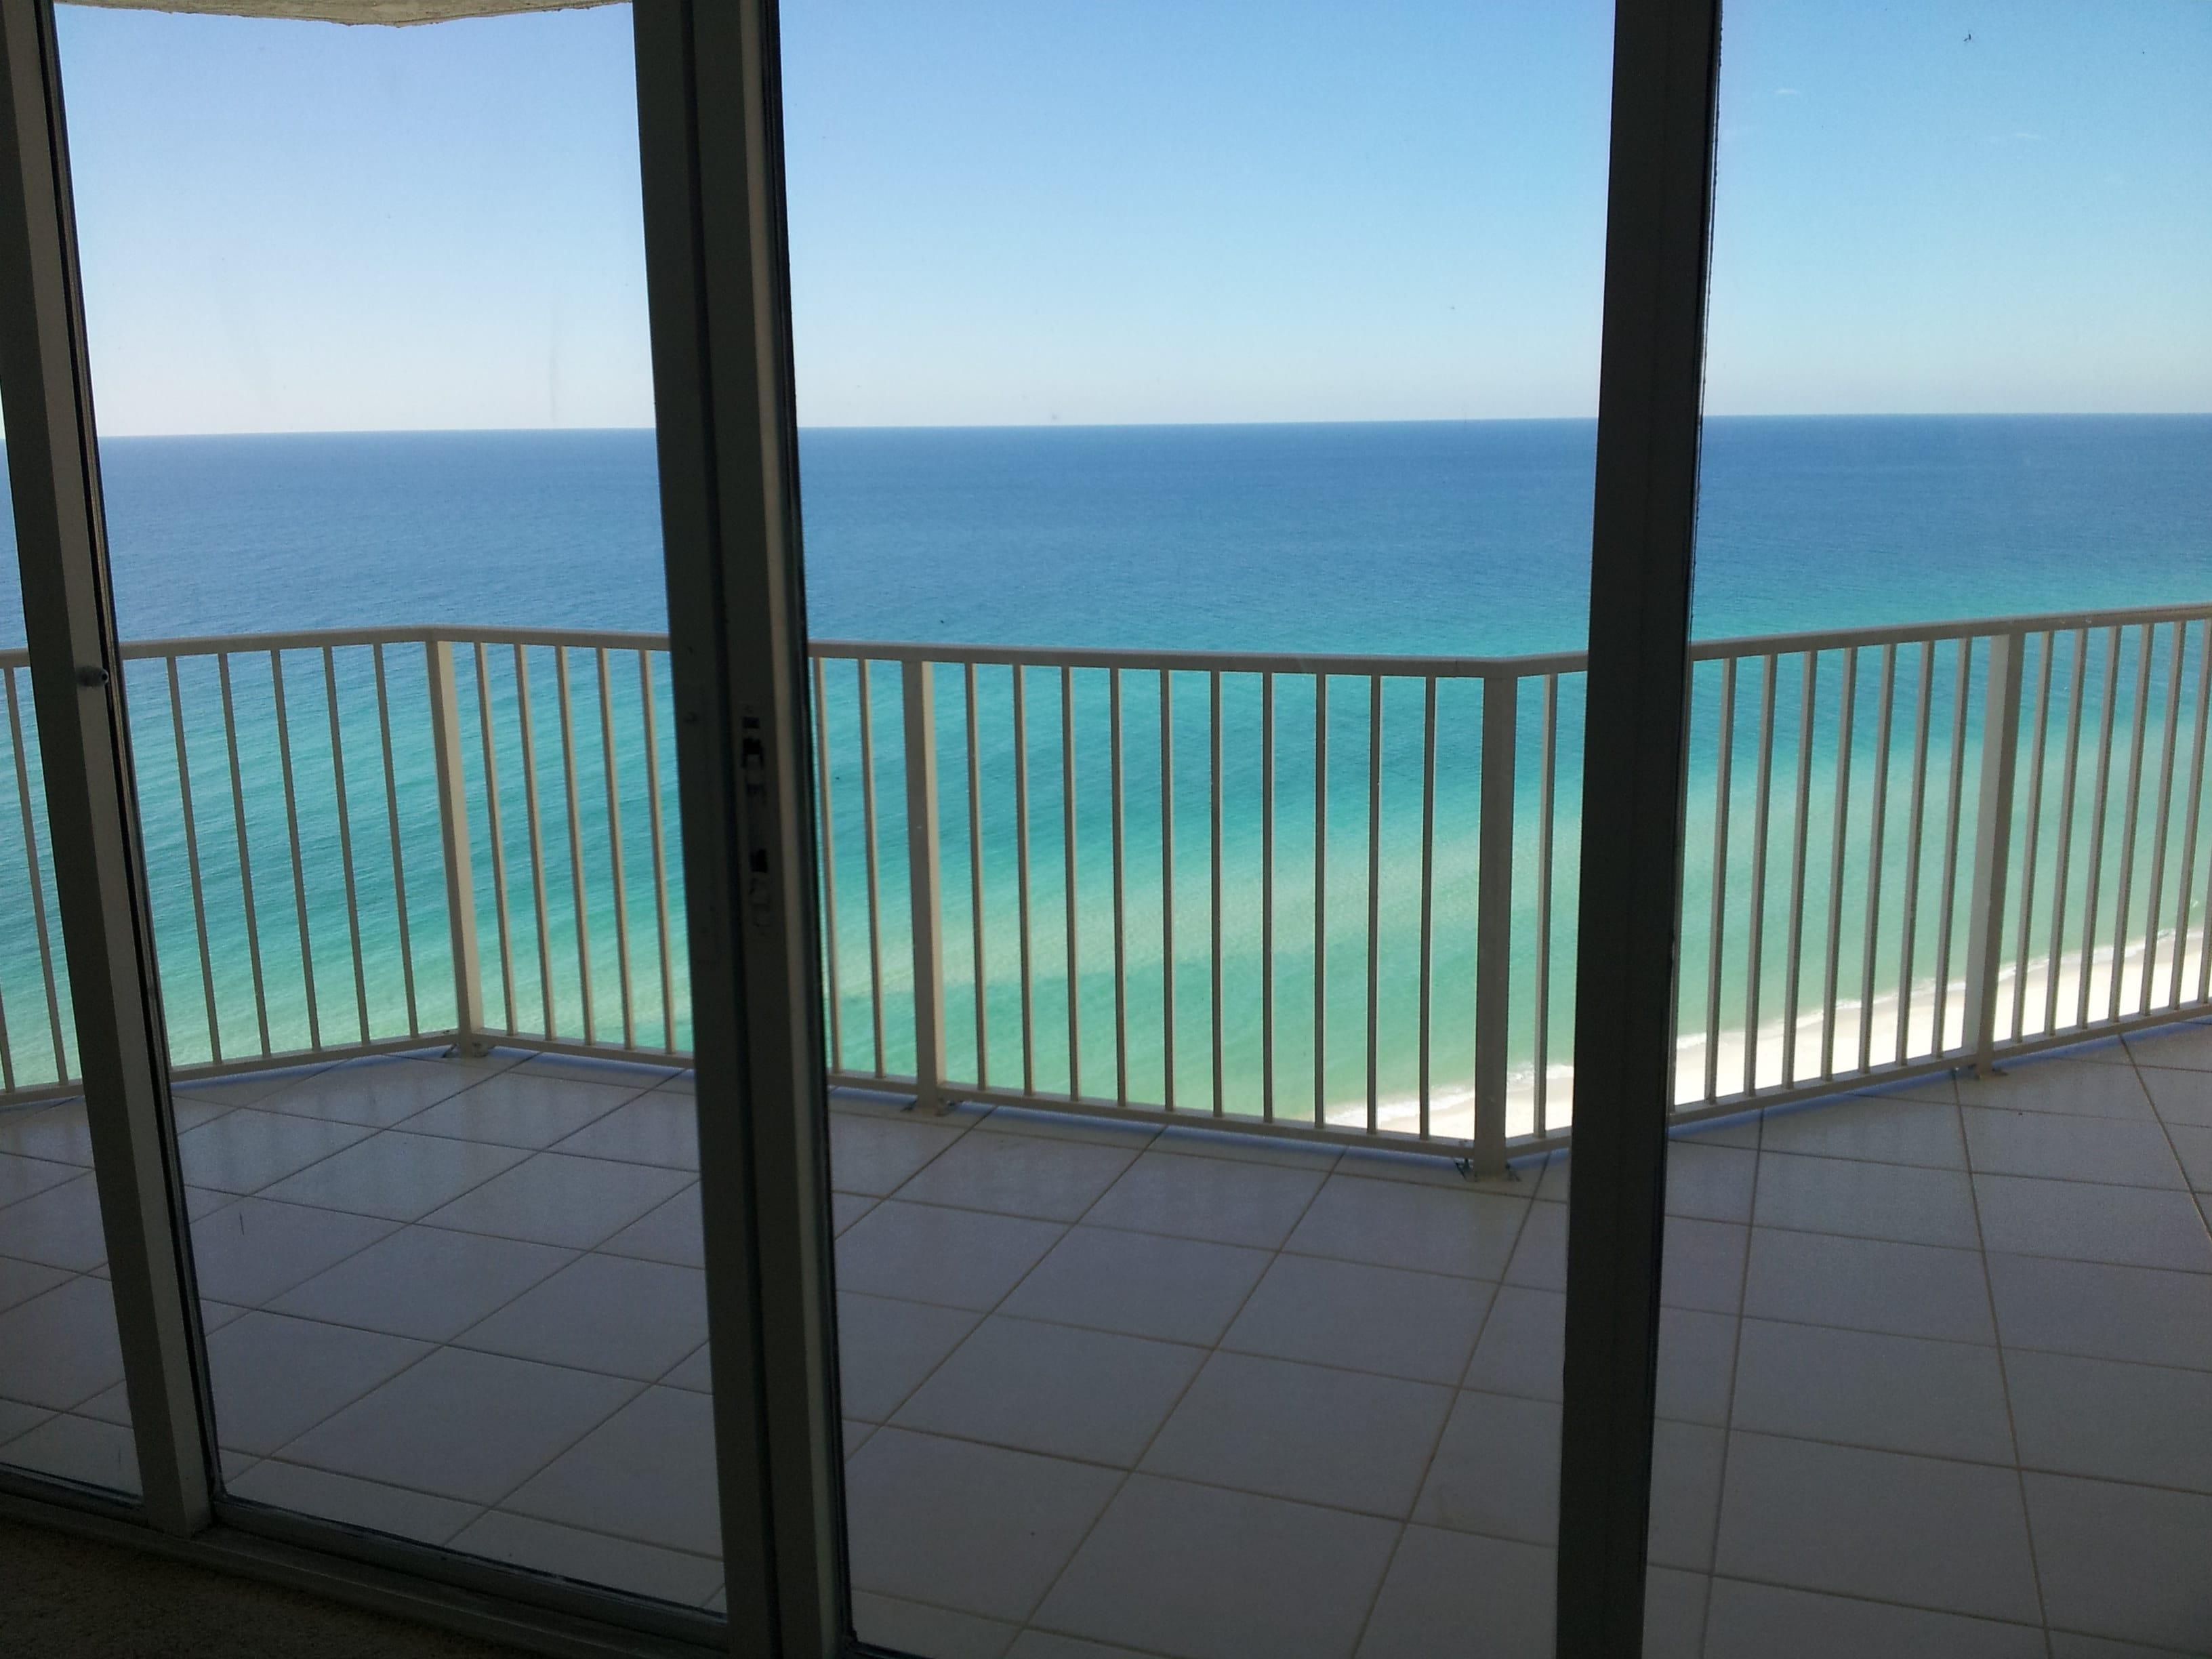 view of balcony and panama city beach from dunes of panama tower e condominium unit